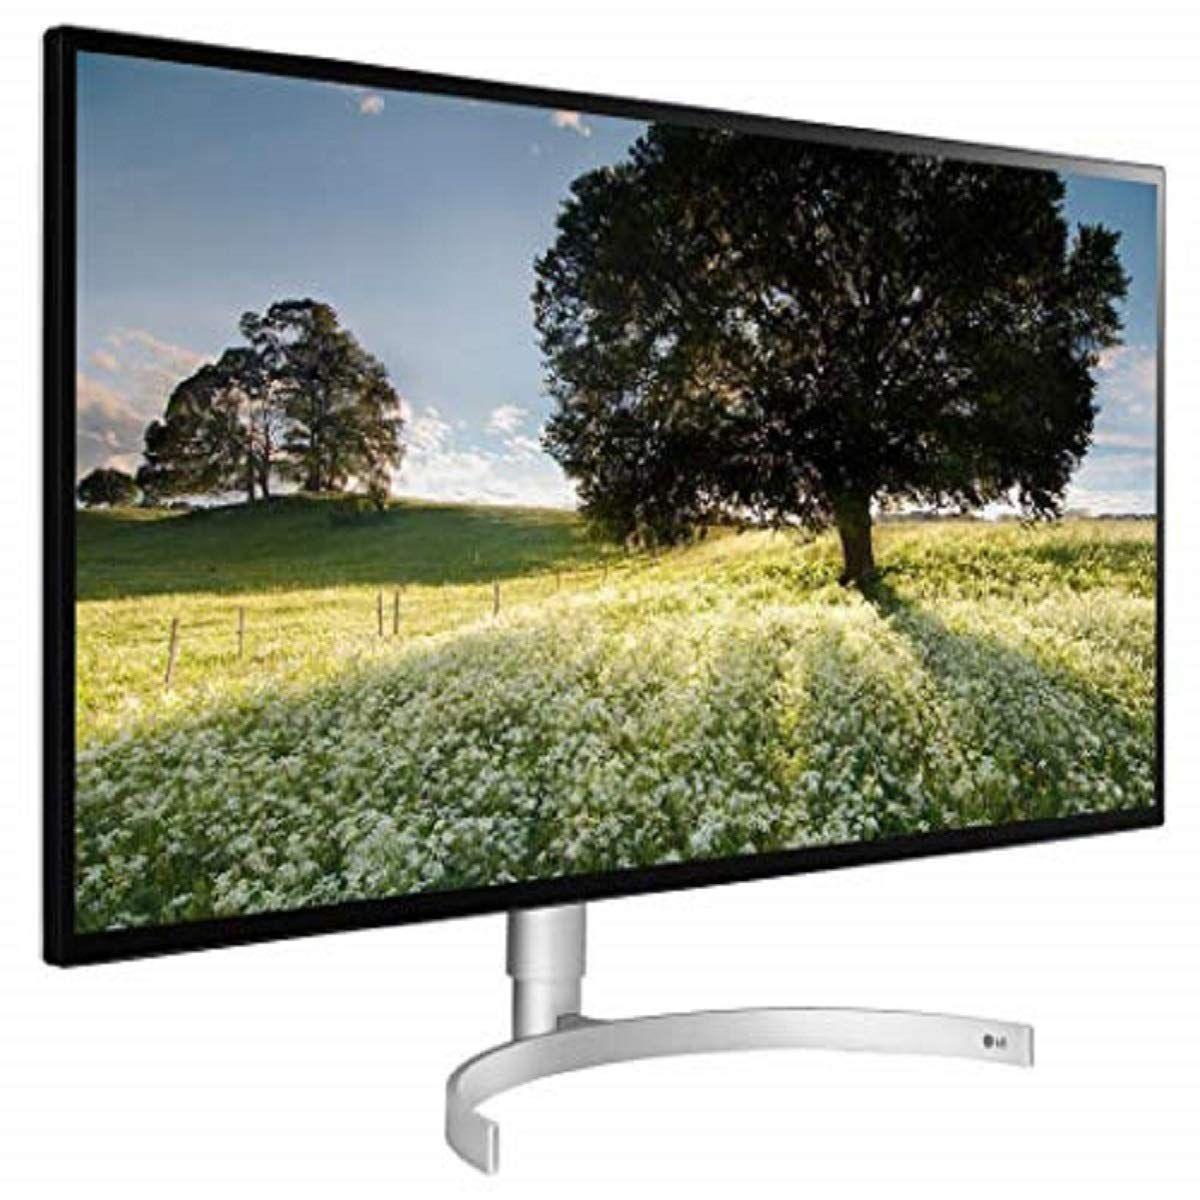 "LG 34WK95U-W 34"" UltraWide 5K2K Monitor"